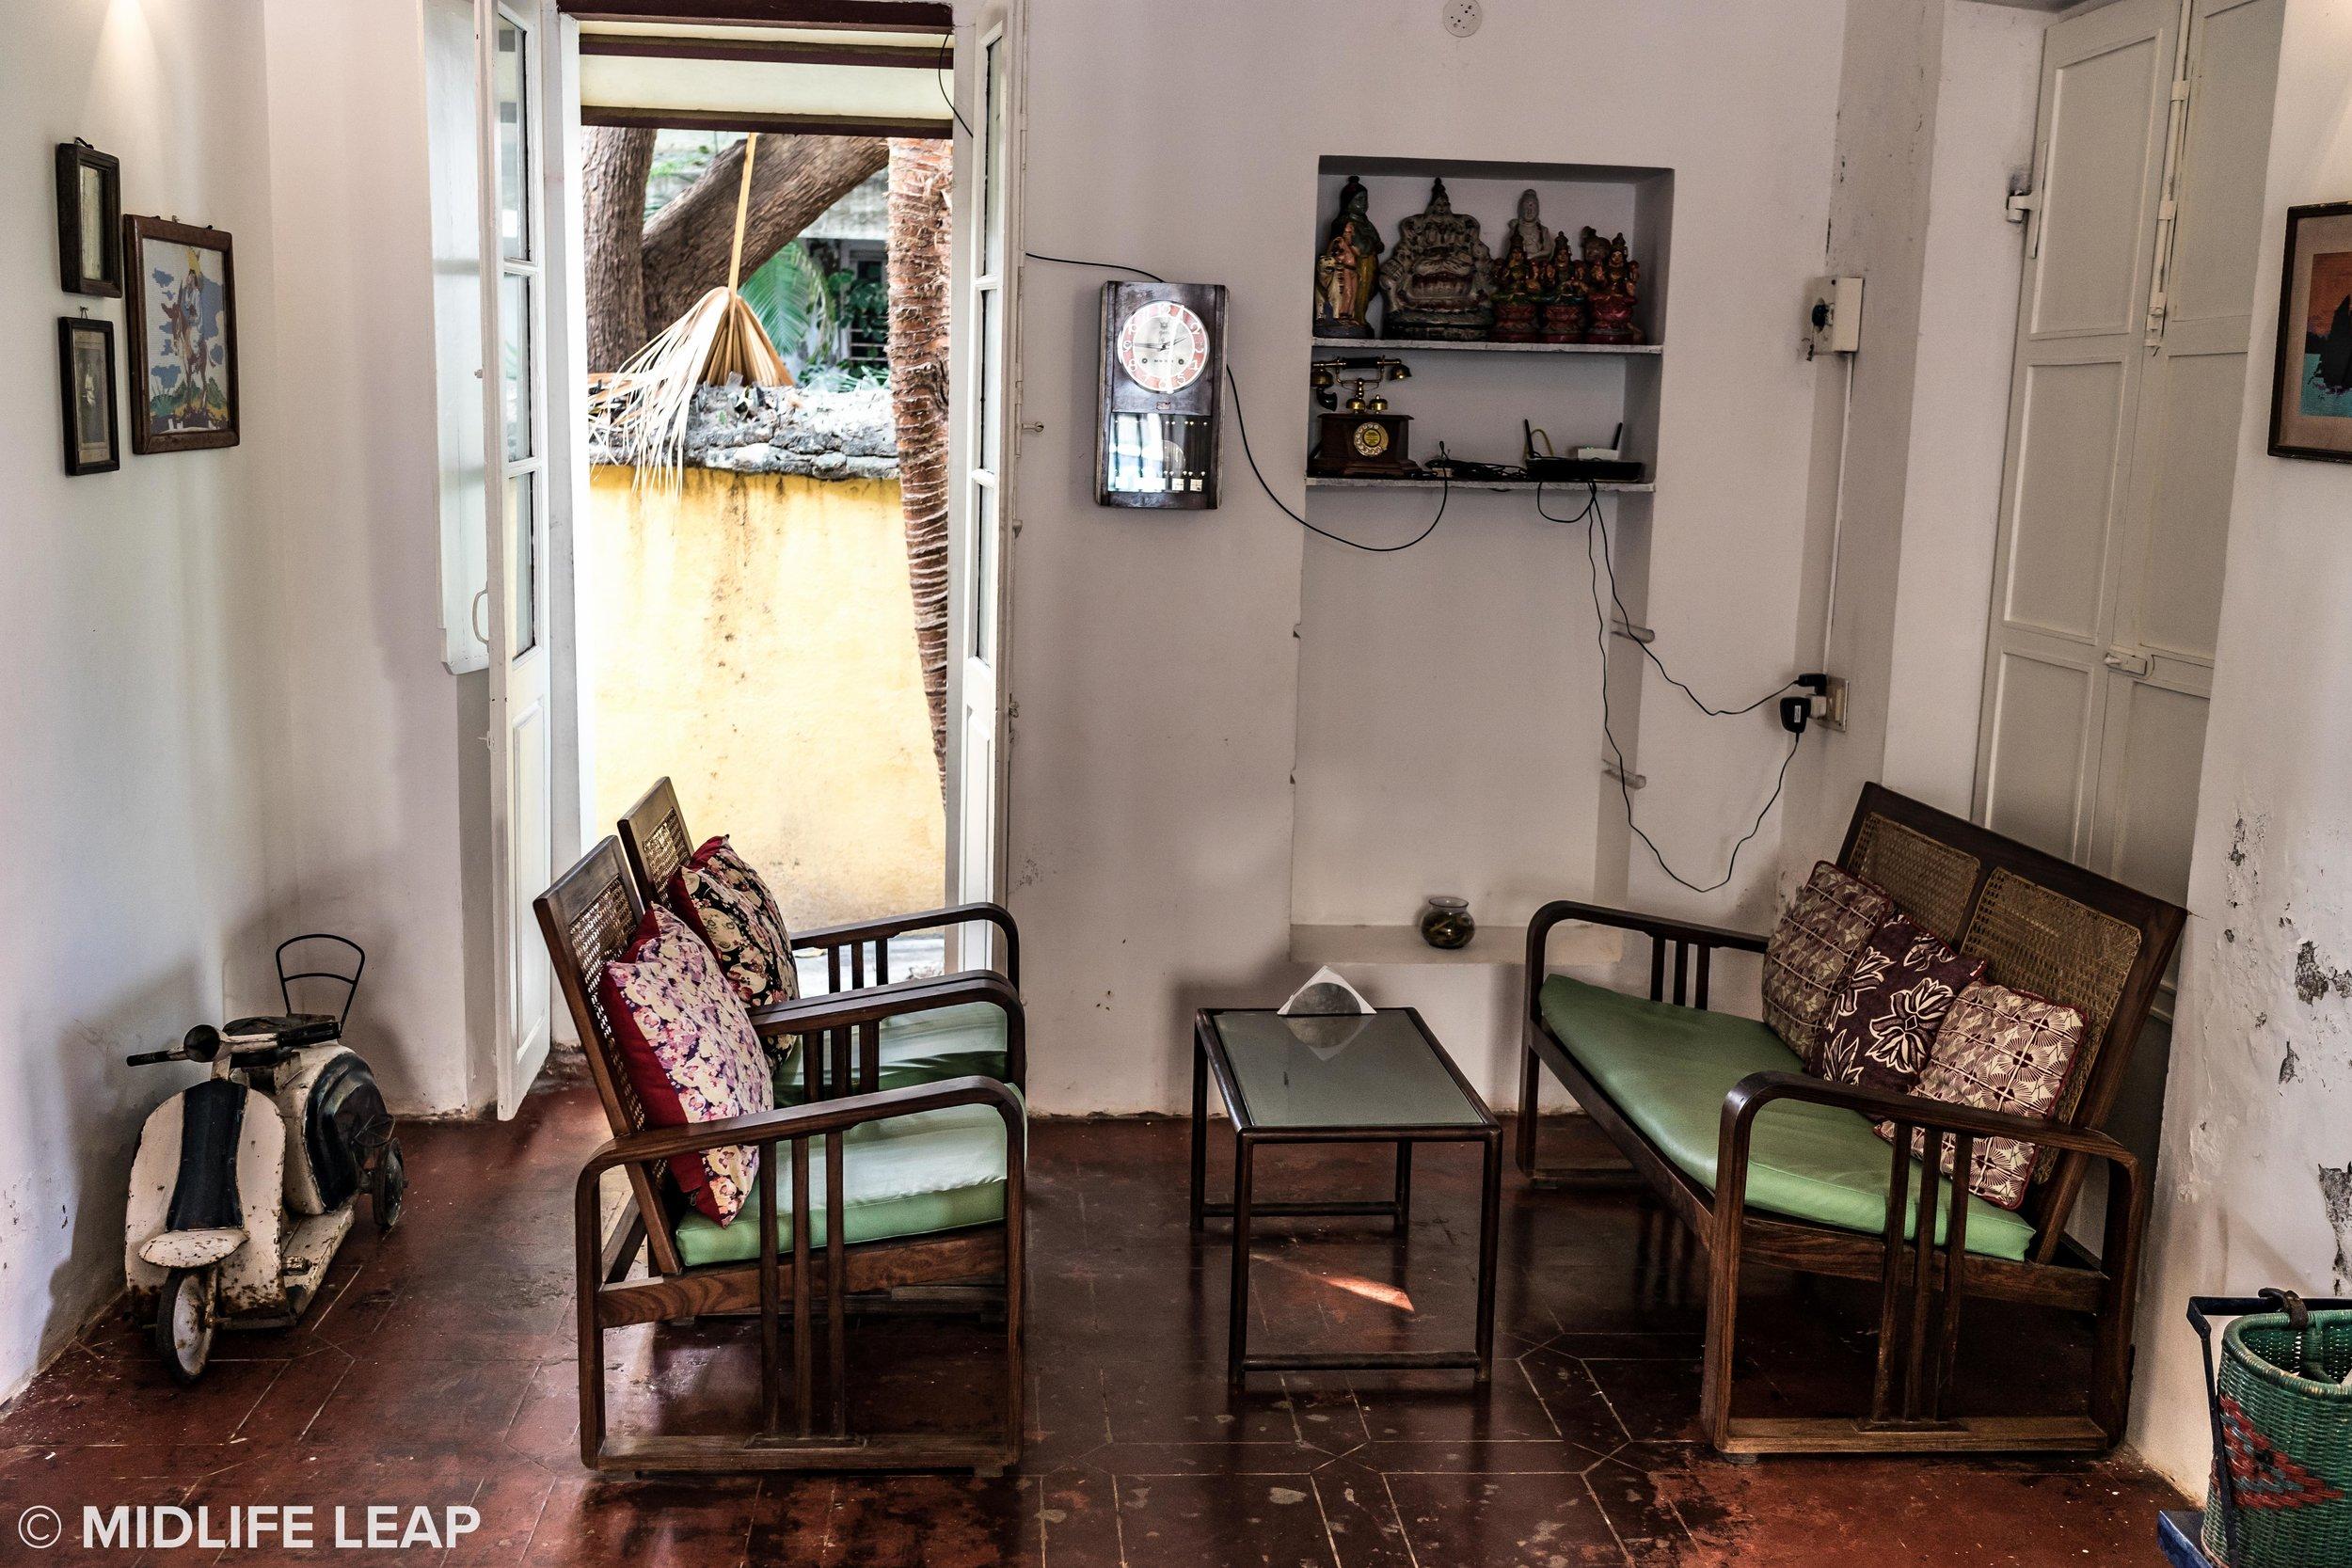 Interior of Cafe Des Arts